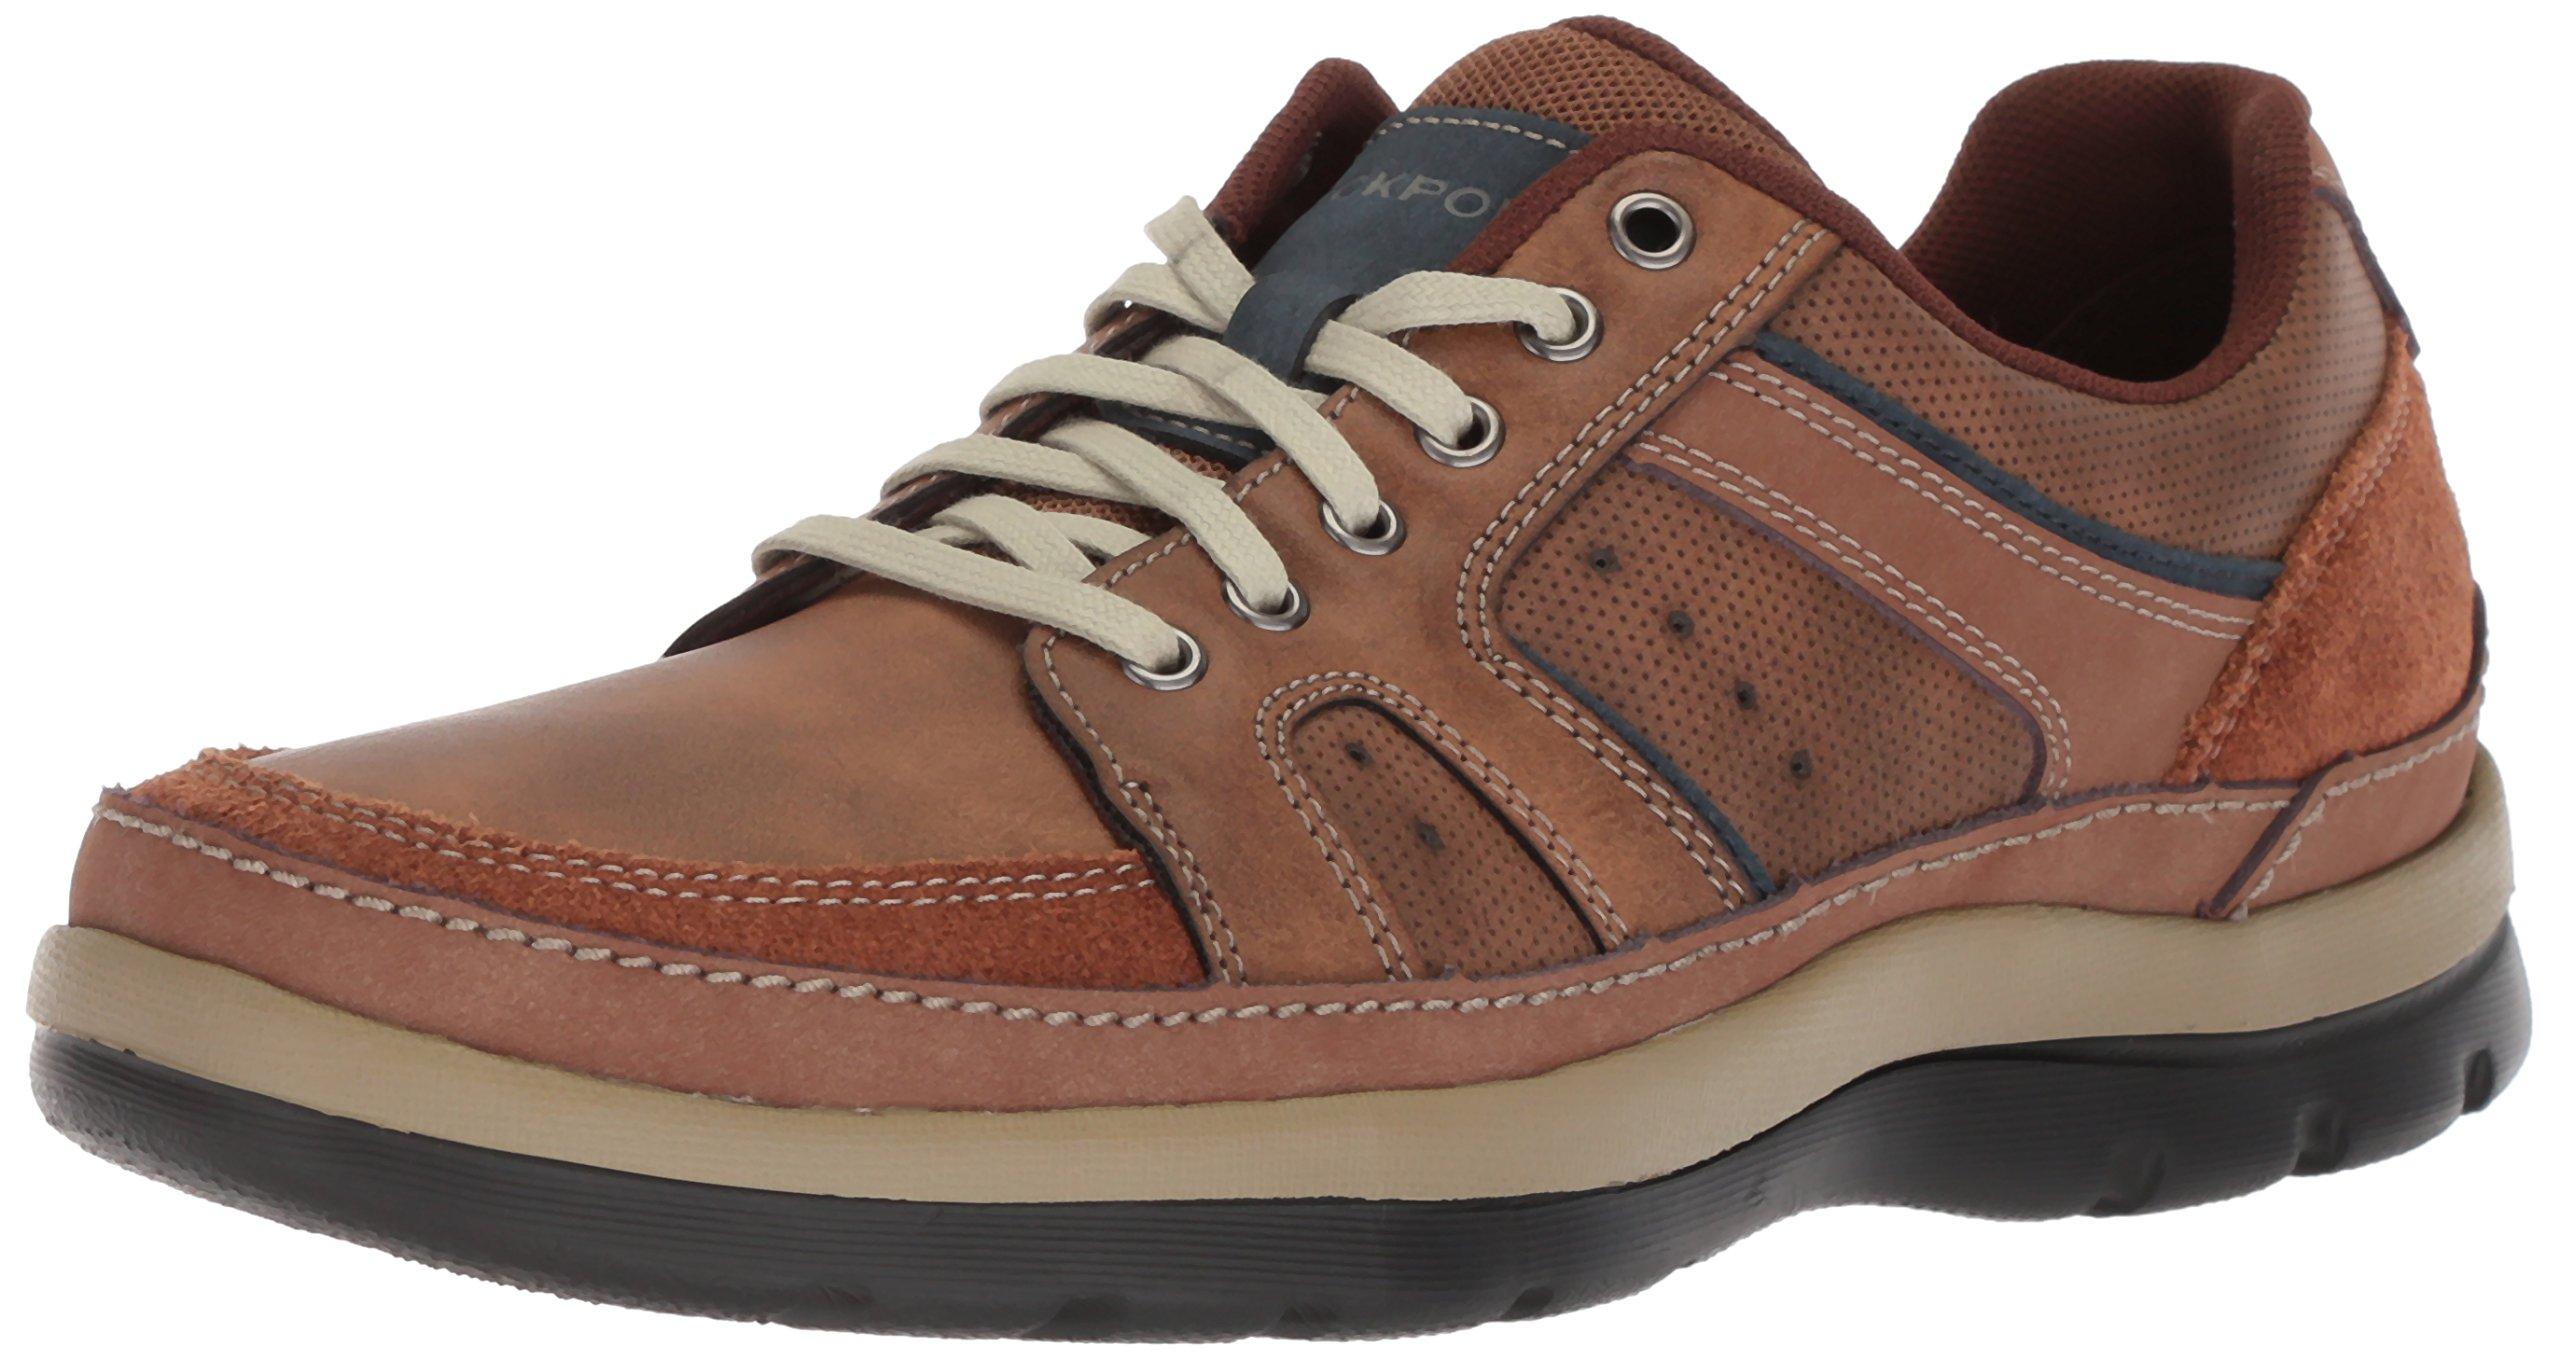 Rockport Men's Get Your Kicks Mudguard Blucher Shoe, tan embossed, 11.5 W US